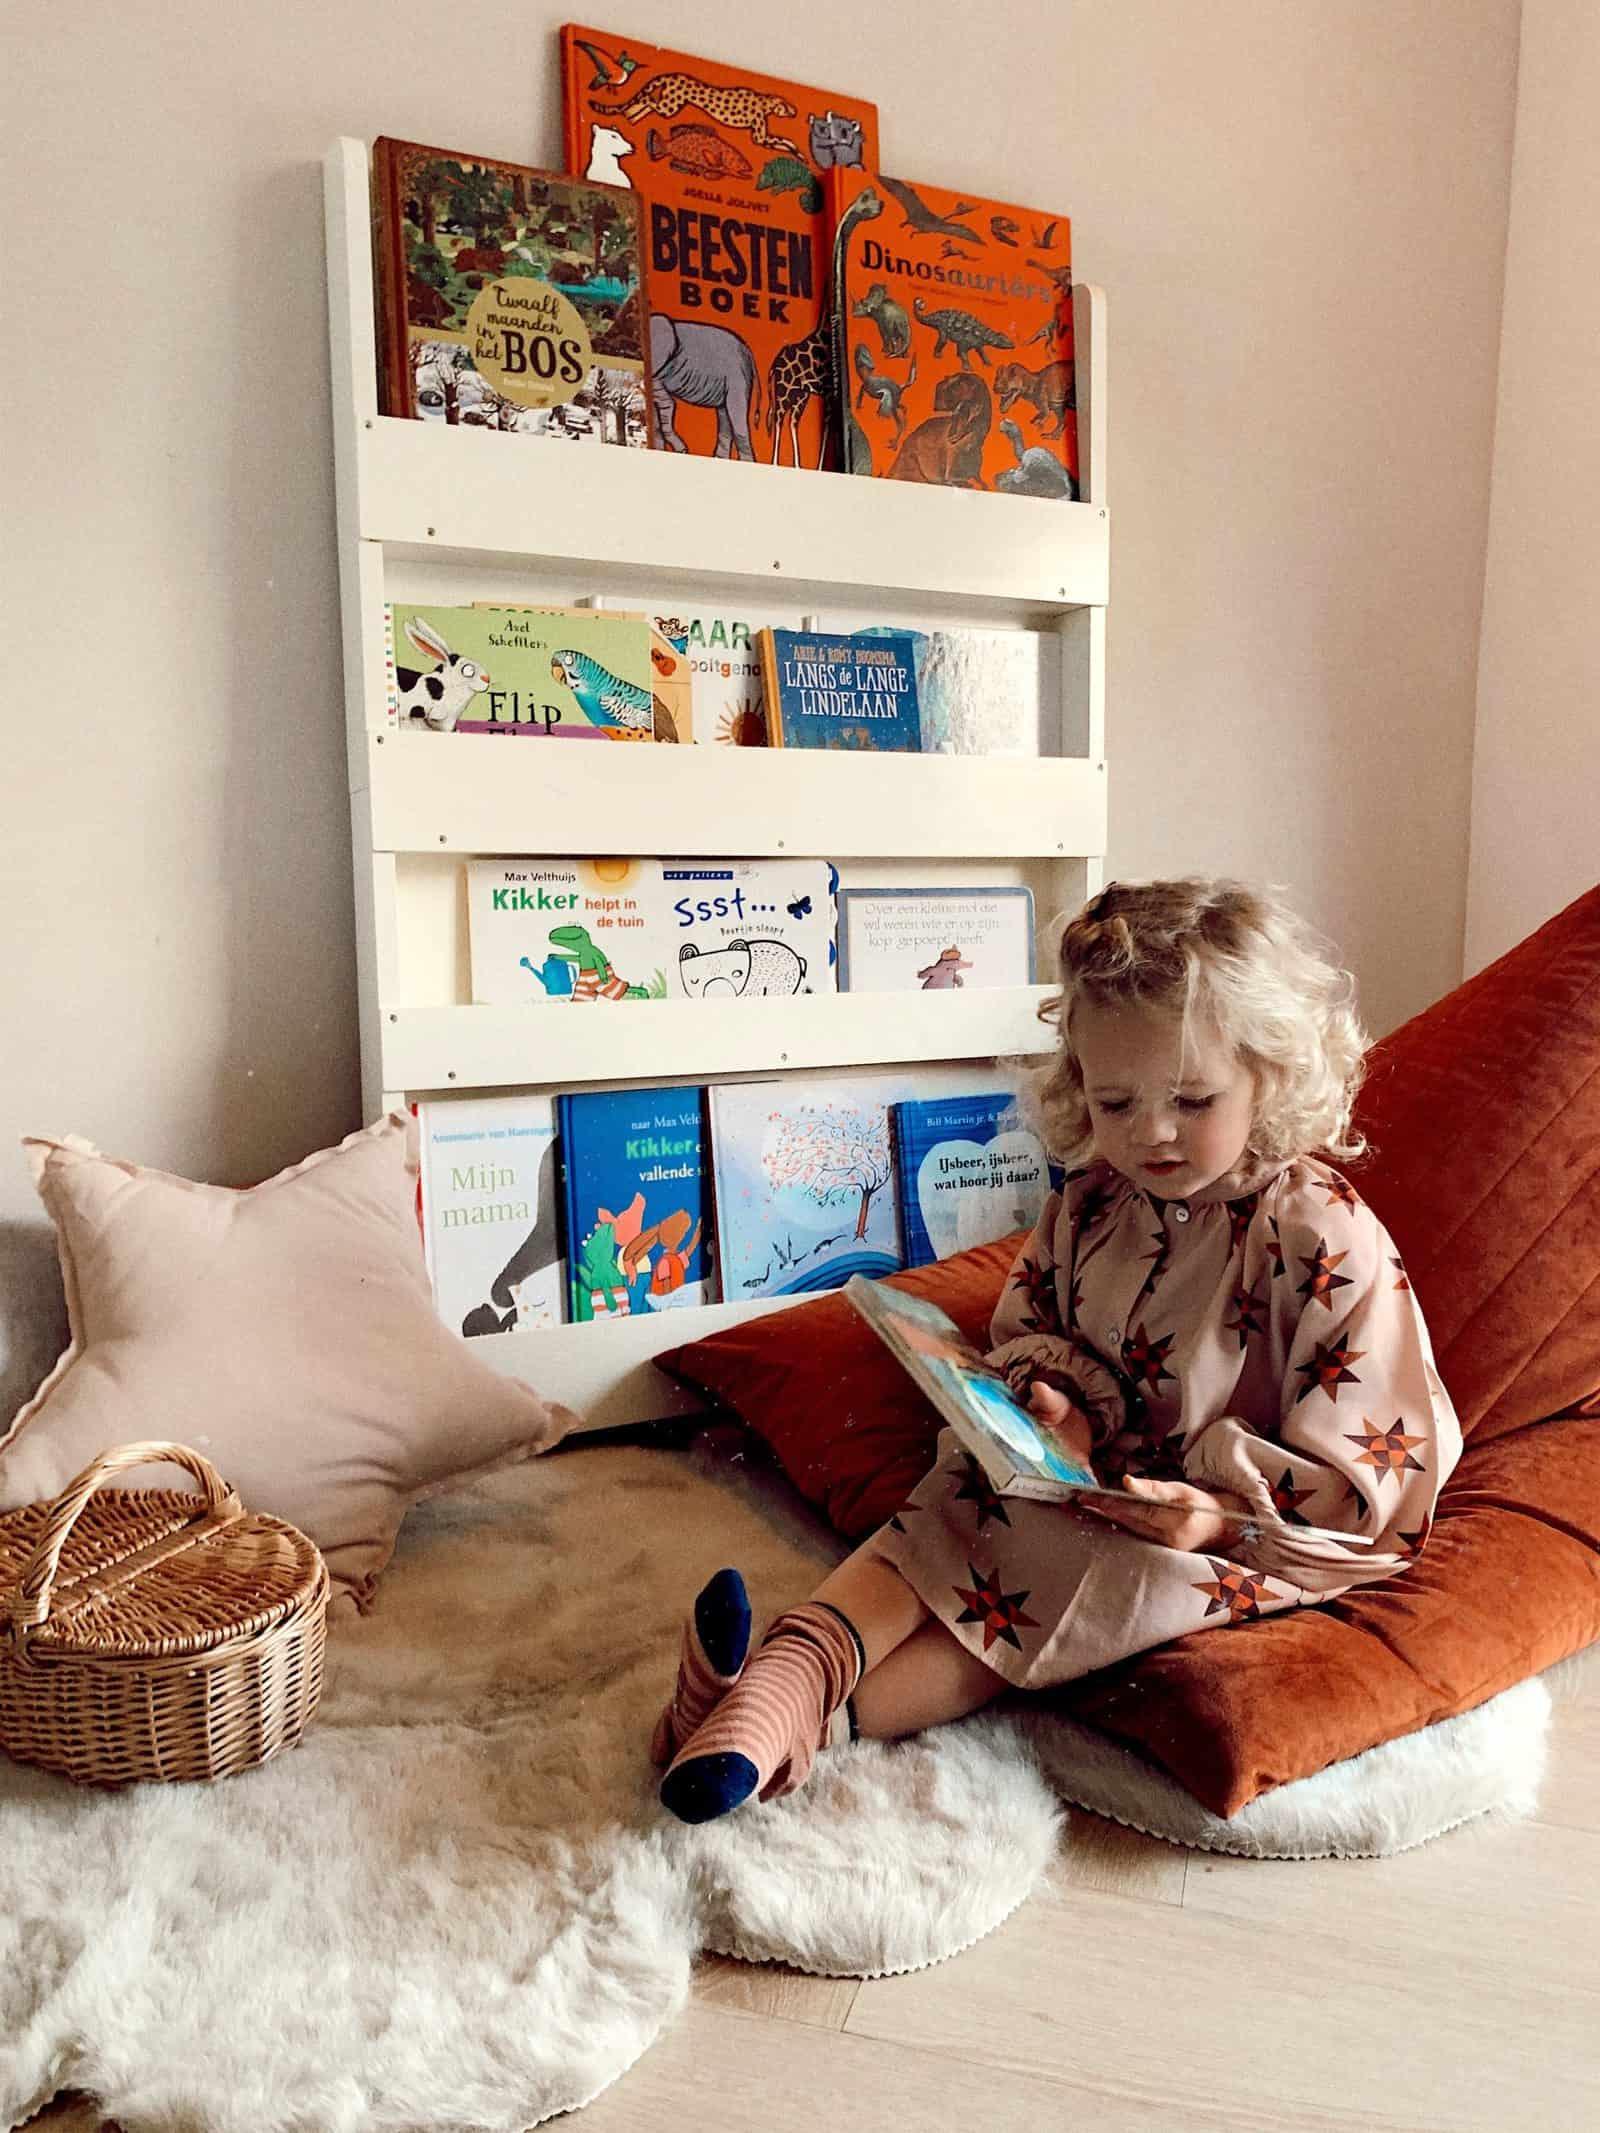 phone addiction, mobile phones, toddler phone, kids phone use, make reading a habit